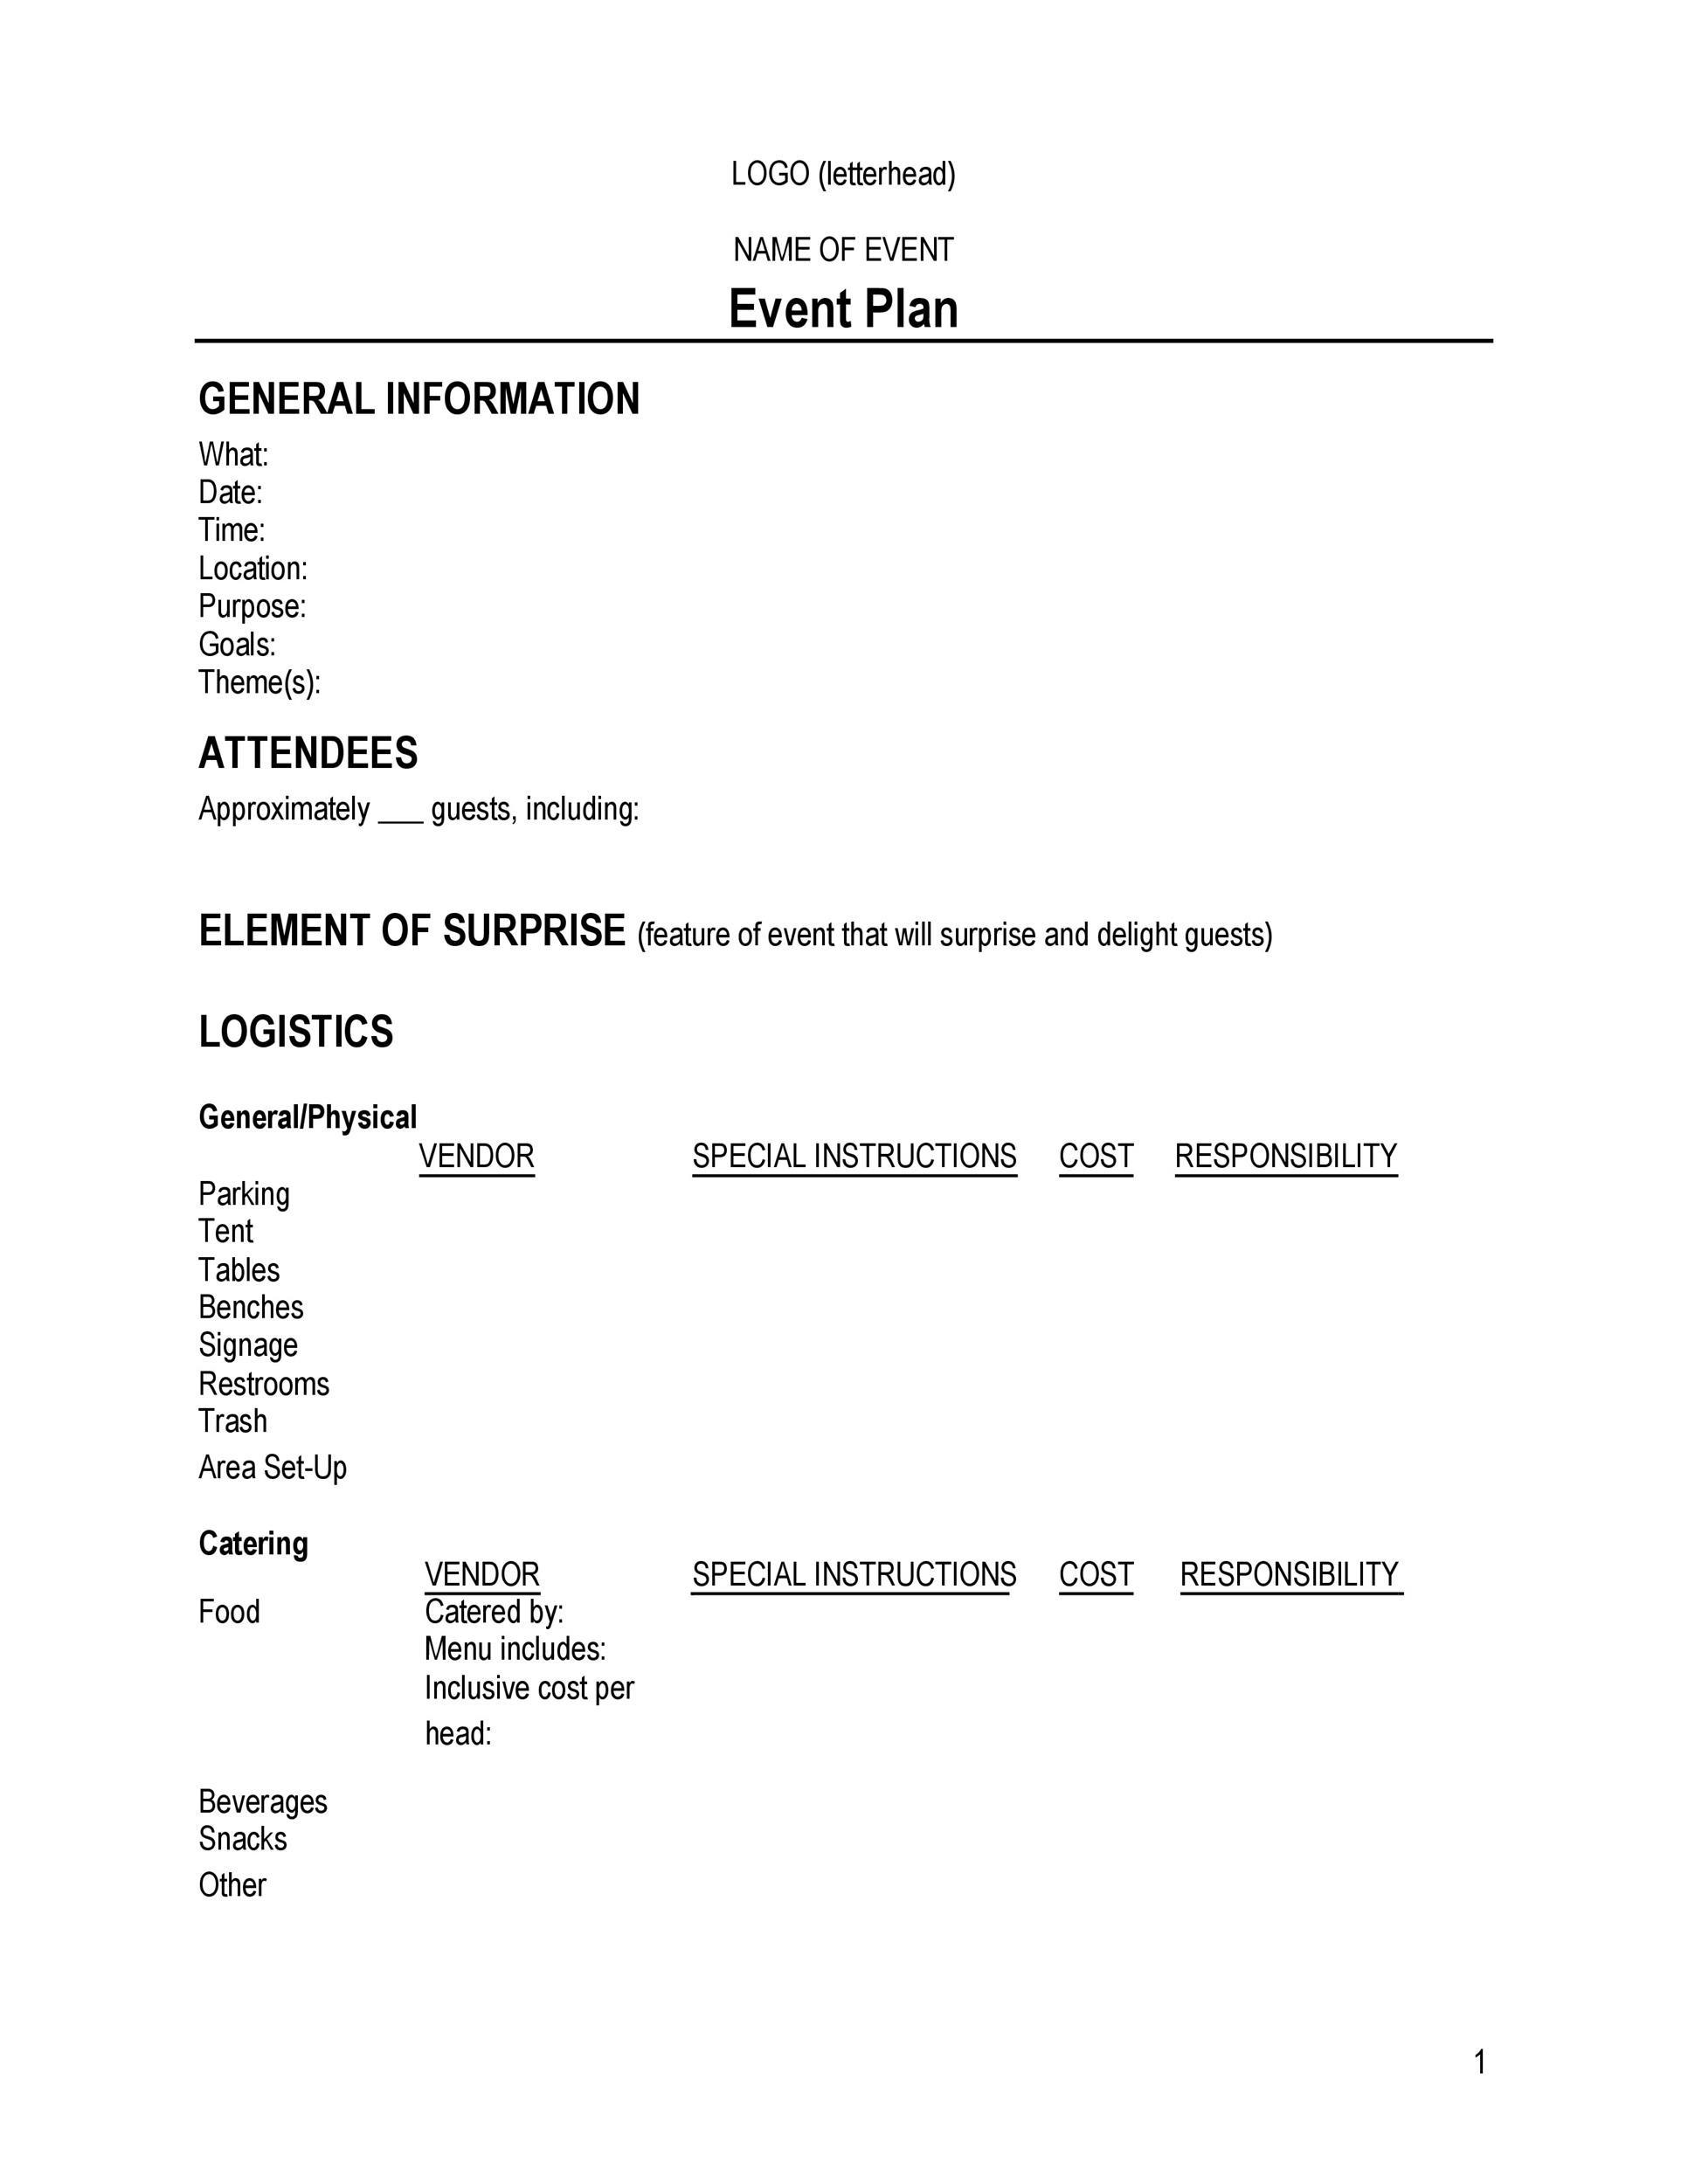 50 Professional Event Planning Checklist Templates - Template Lab - event plan template